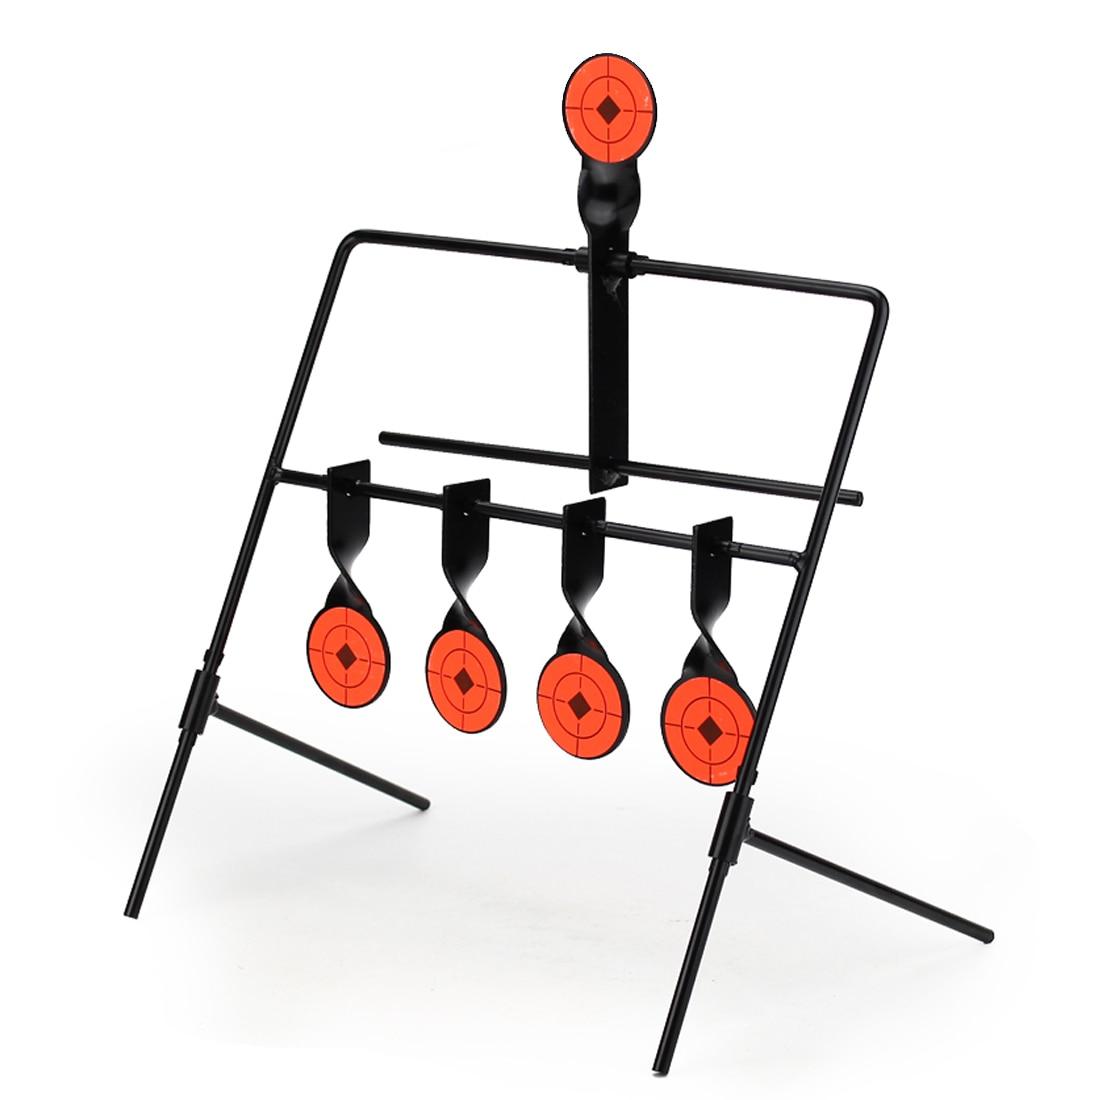 5 Targets Self Resetting Spinning Air Gun Rifle Shooting Metal Target Set Practice Playing For Airsoft For Nerf Firing Playing